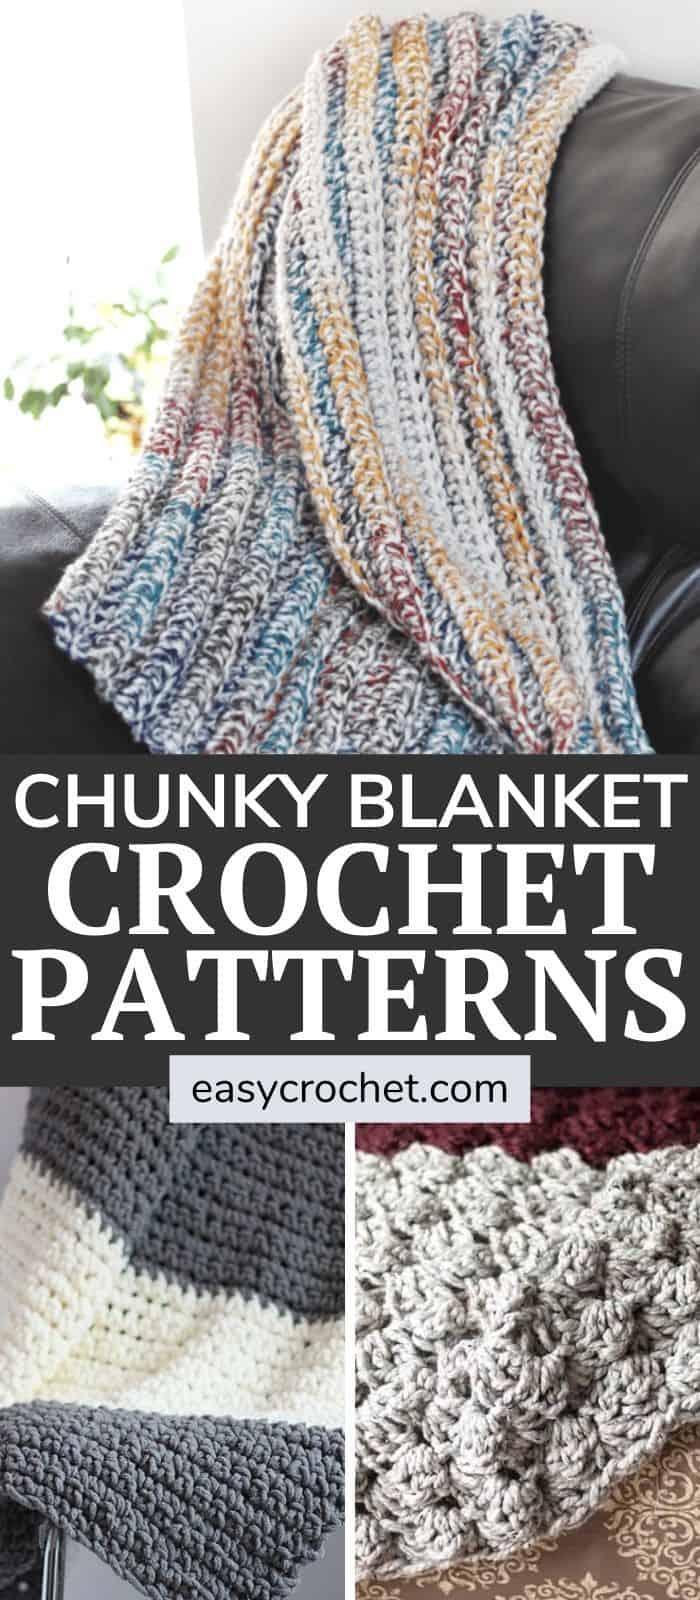 Free Chunky Crochet Blankets That Use Bulky Yarn via @easycrochetcom